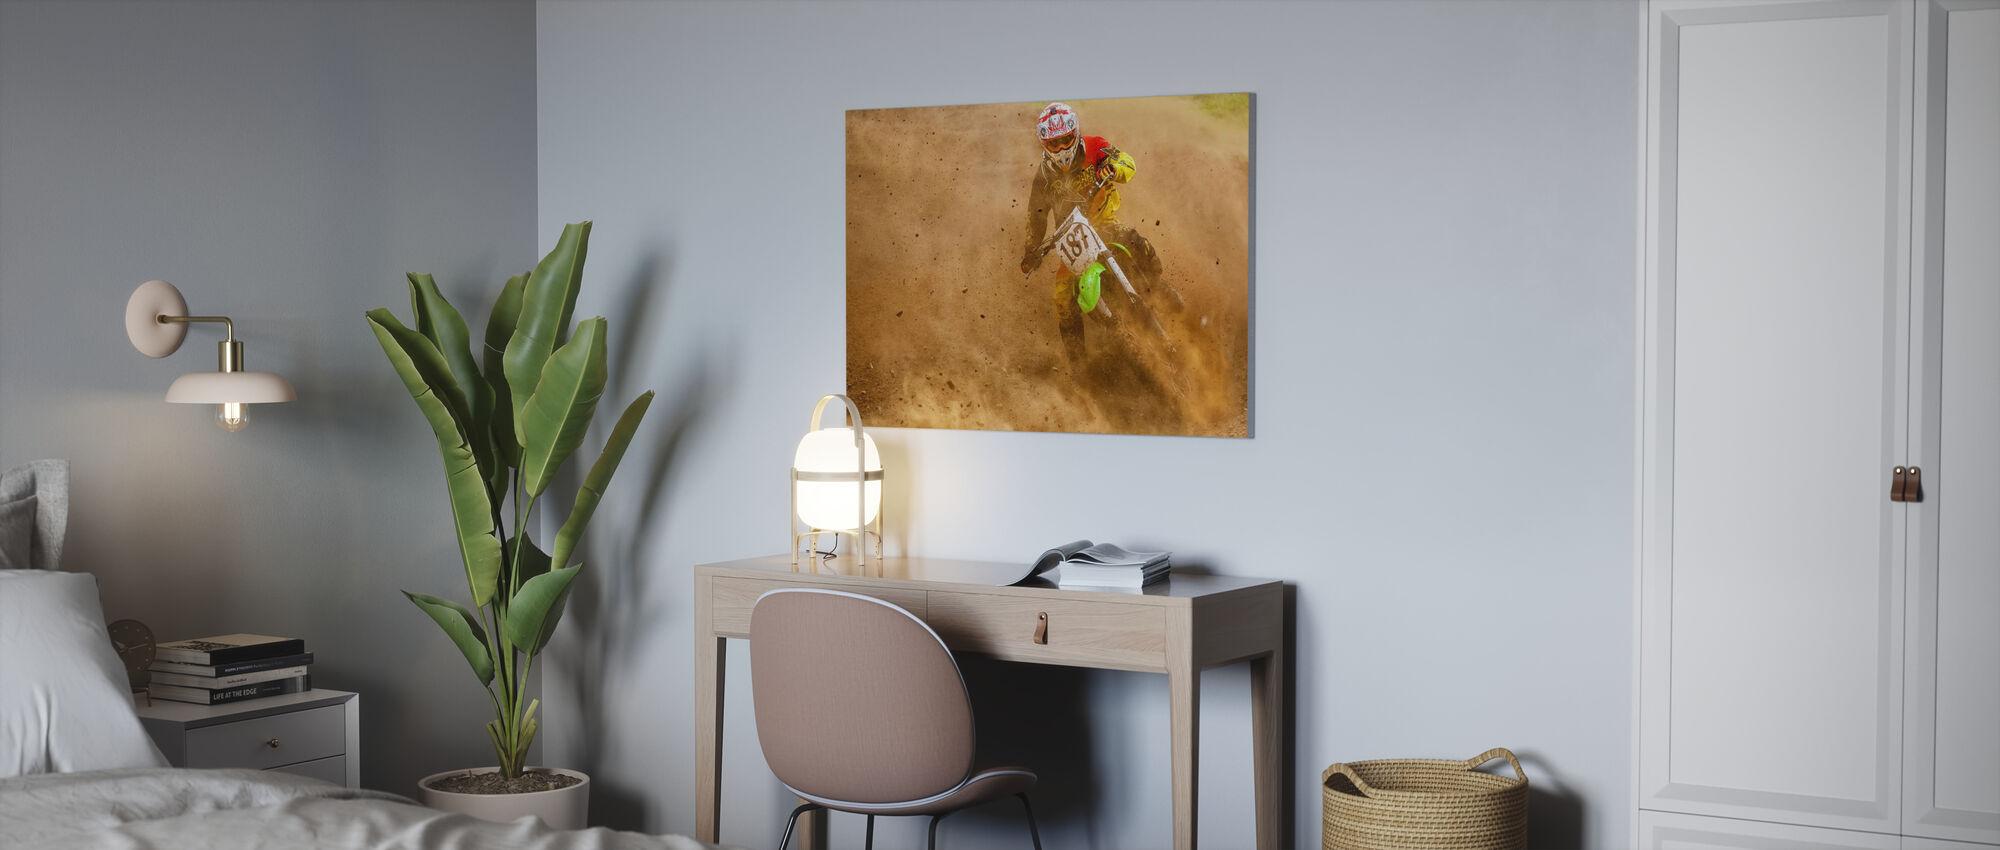 Biker - Canvas print - Office